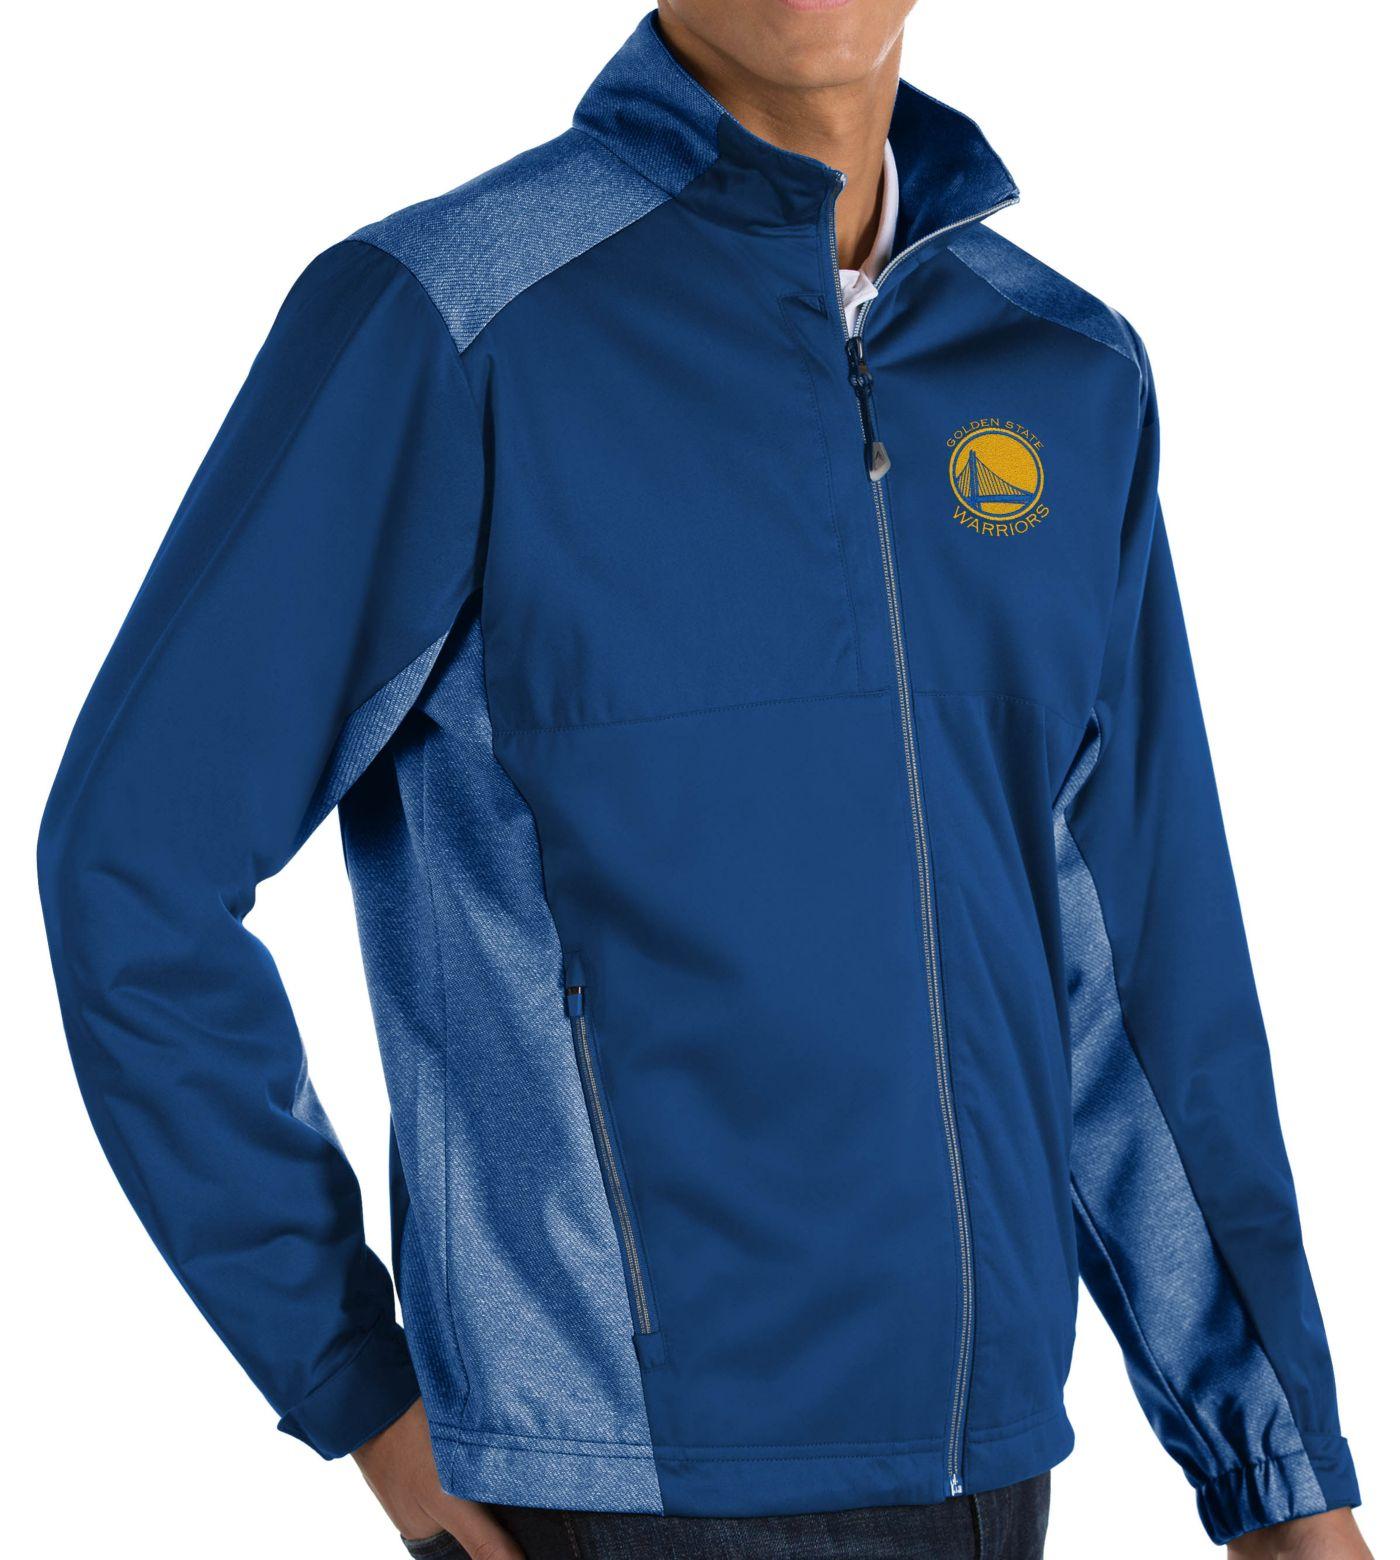 Antigua Men's Golden State Warriors Revolve Full-Zip Jacket